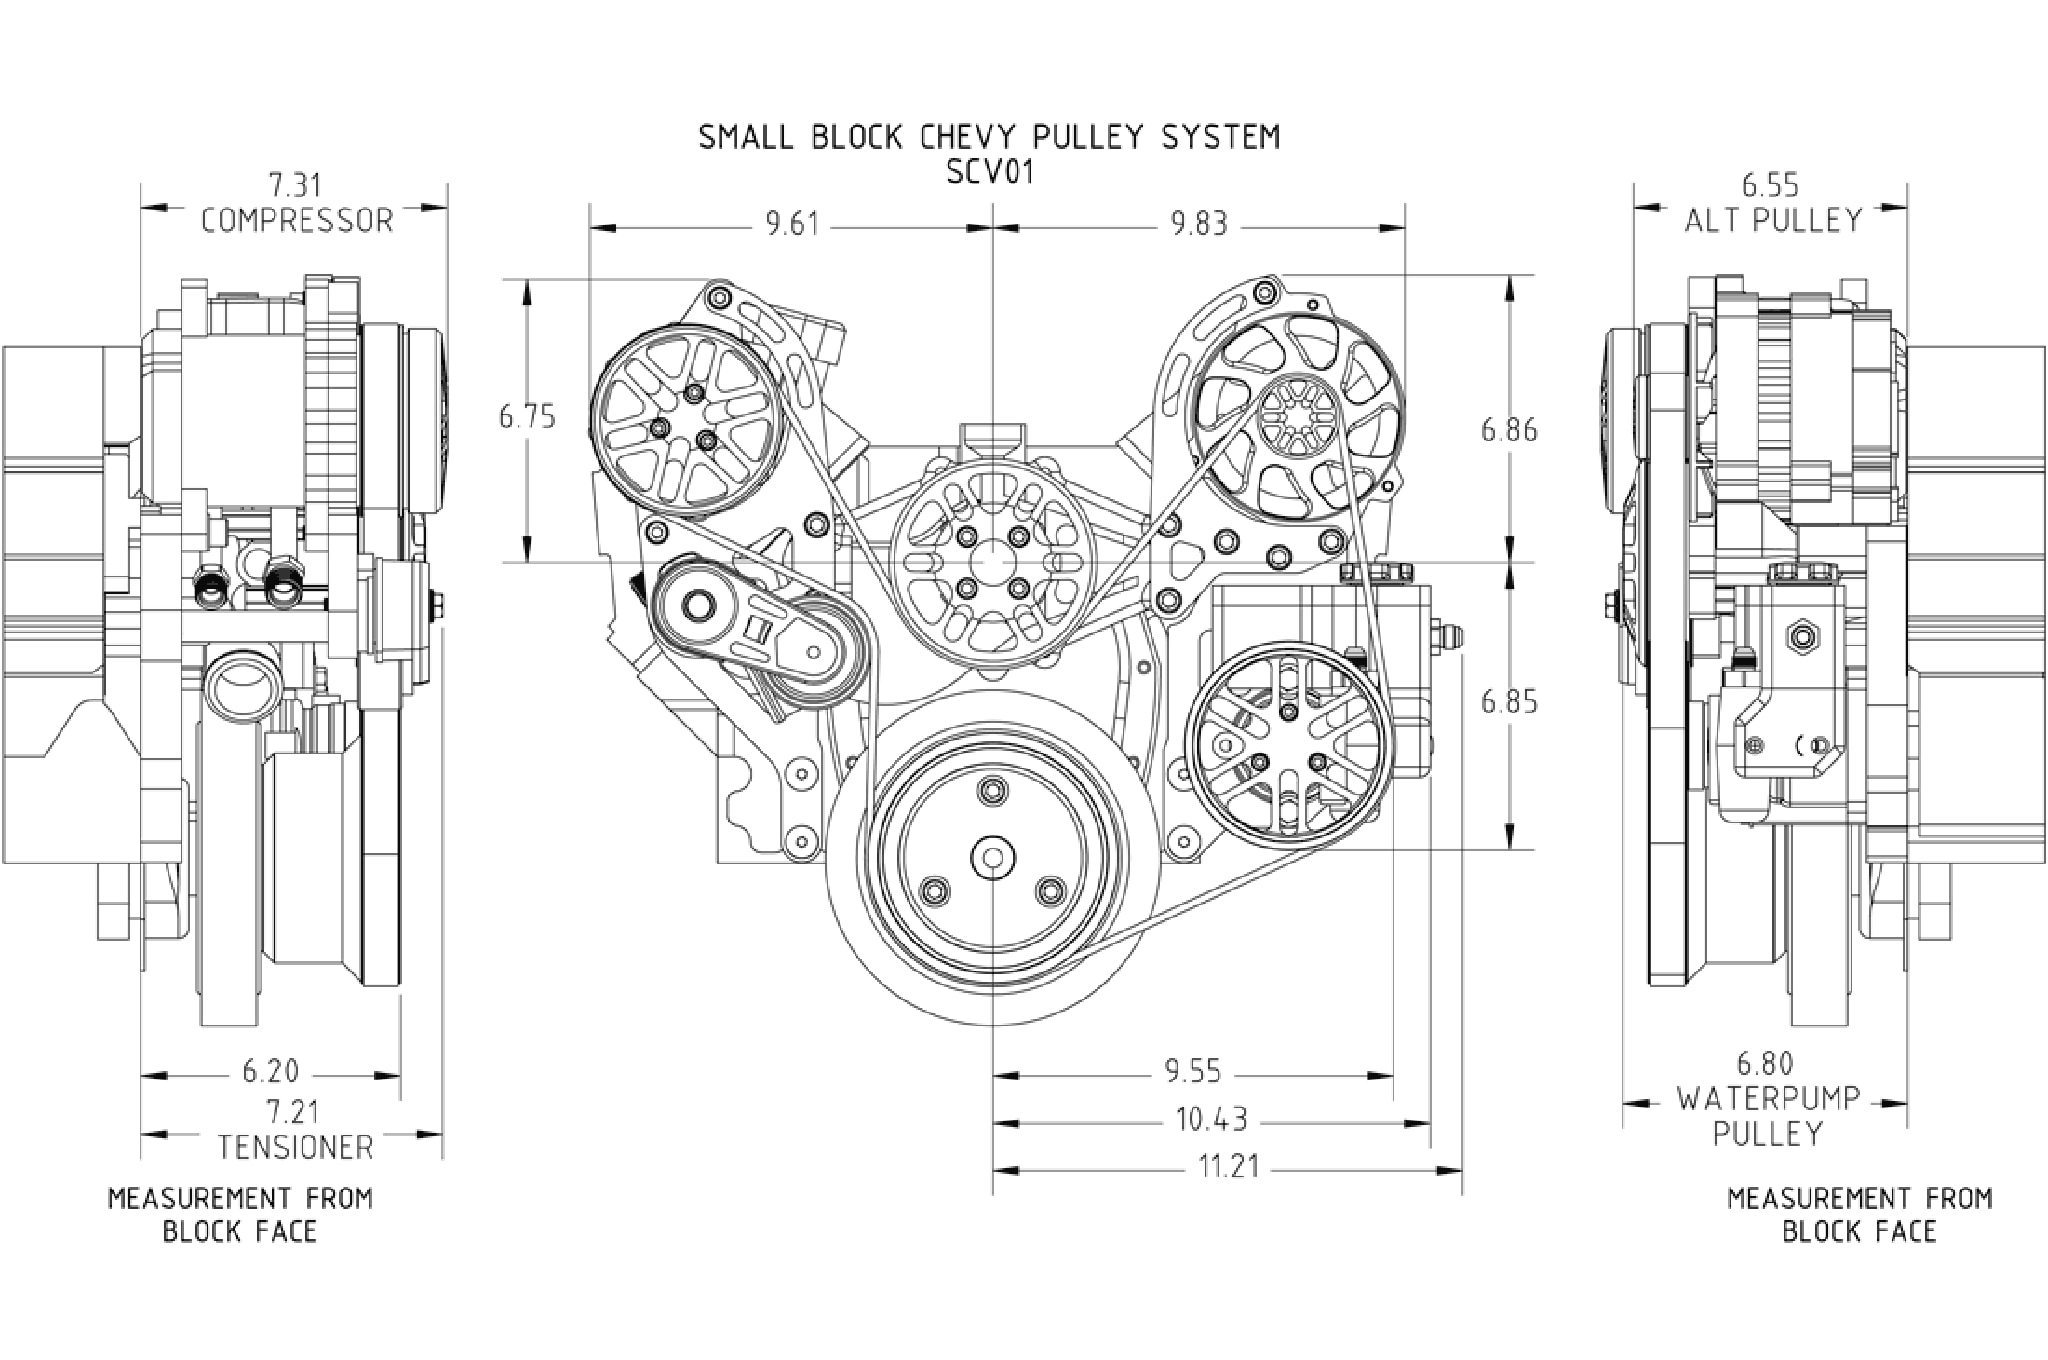 2006 Buick Lacrosse Fuse Box Diagram